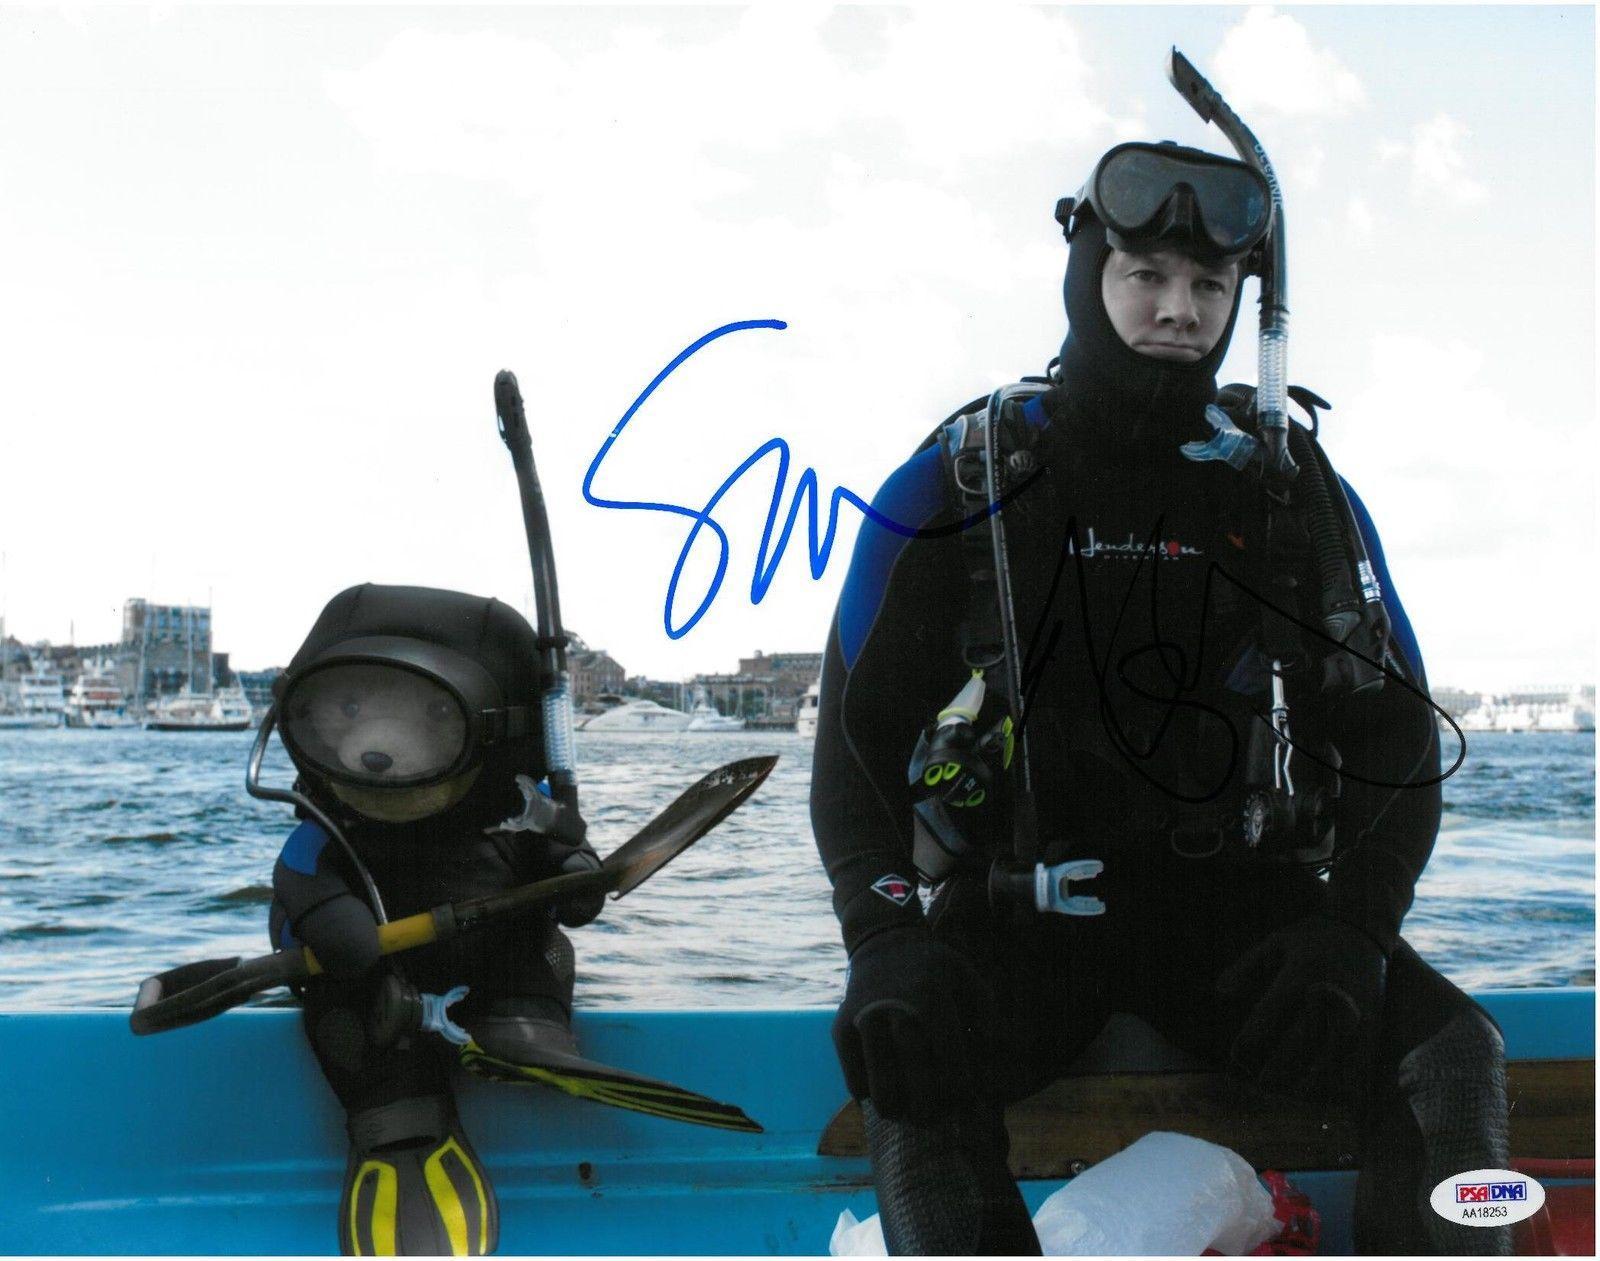 Mark Wahlberg & Seth MacFarlane Signed Ted 2 Auto 11x14 Photo PSA/DNA #AA18253